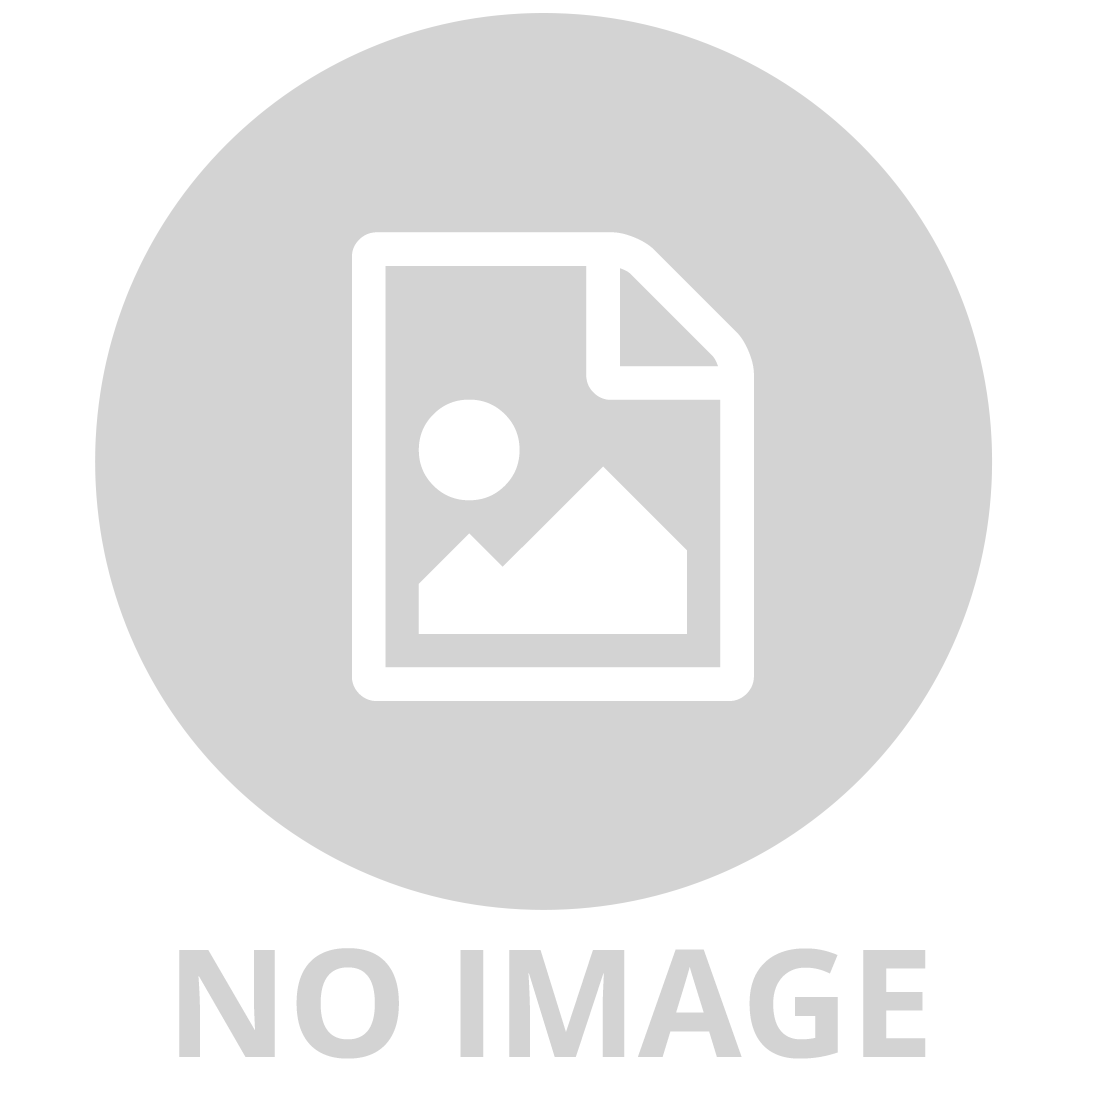 COLORIFIC GLOW ZONE STARS